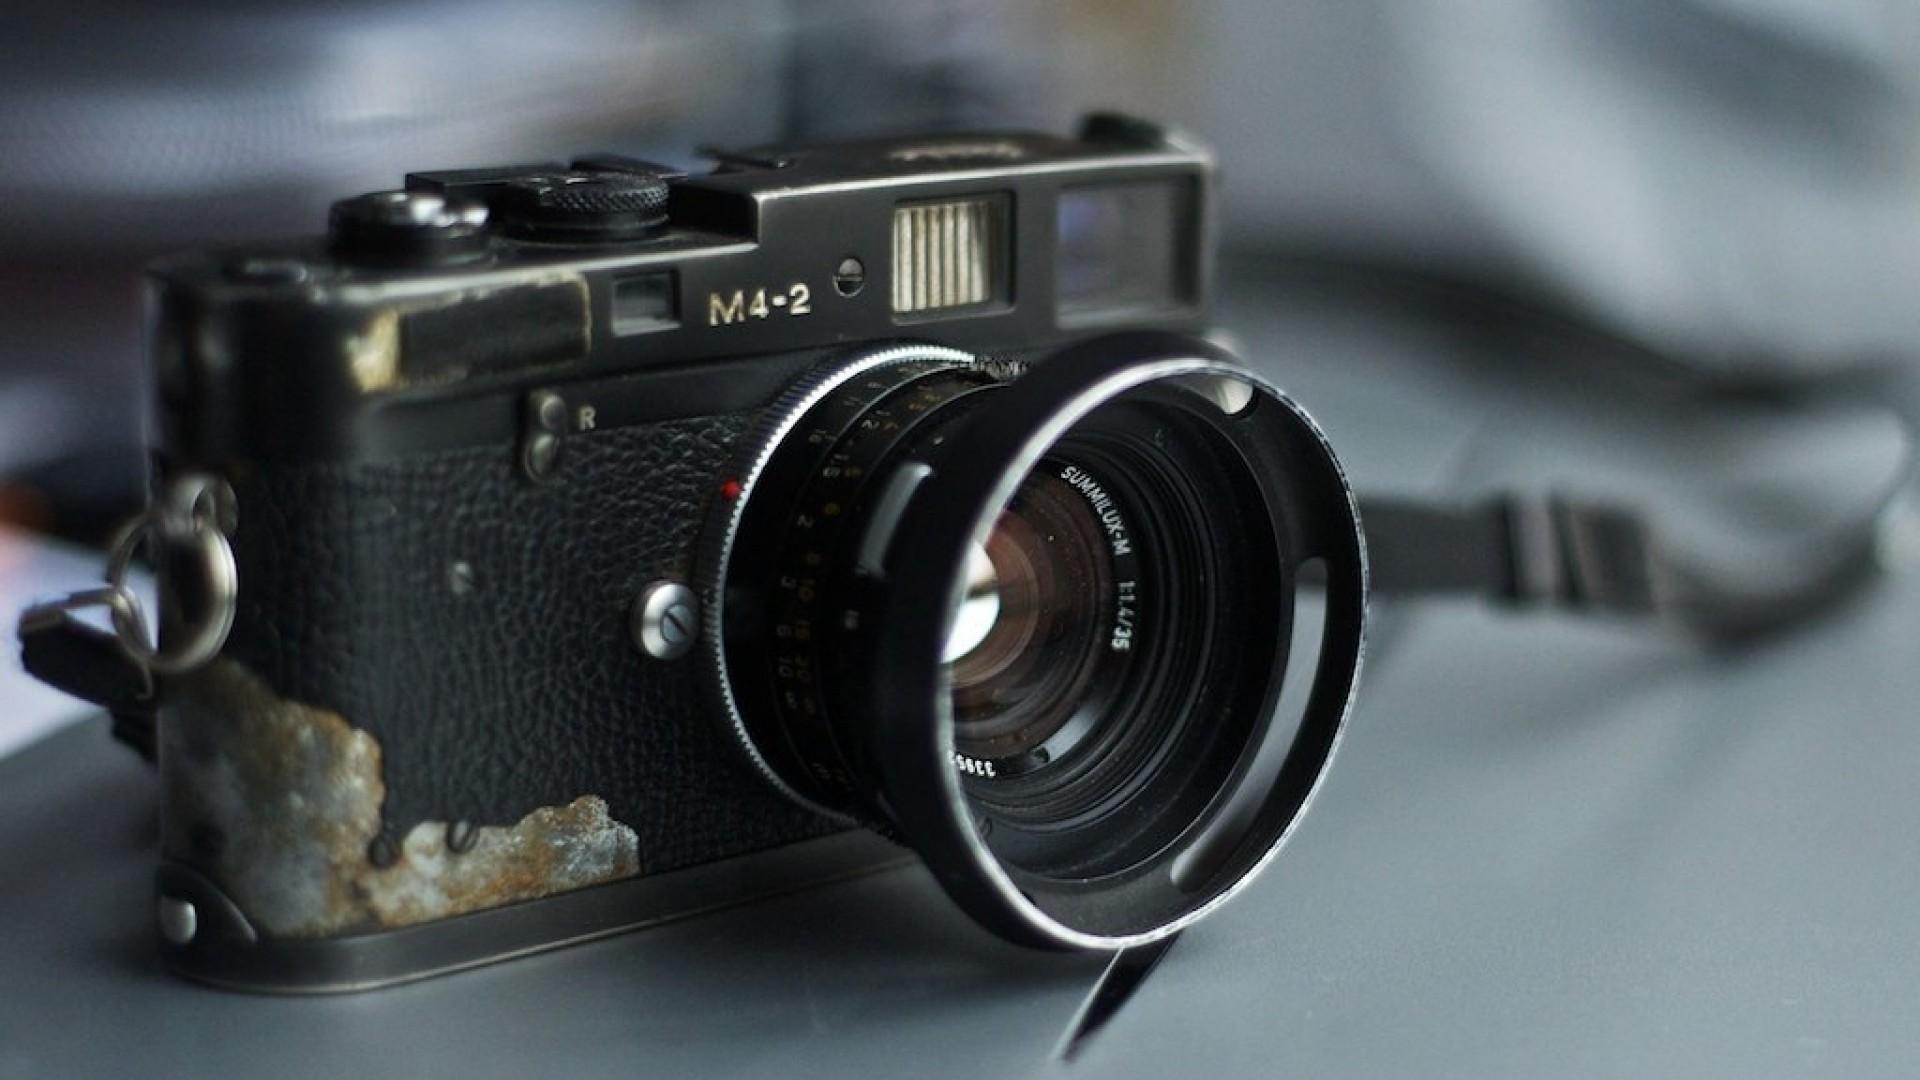 0195 retro vintage camcorder 8mm movie photo montage naked - 5 10